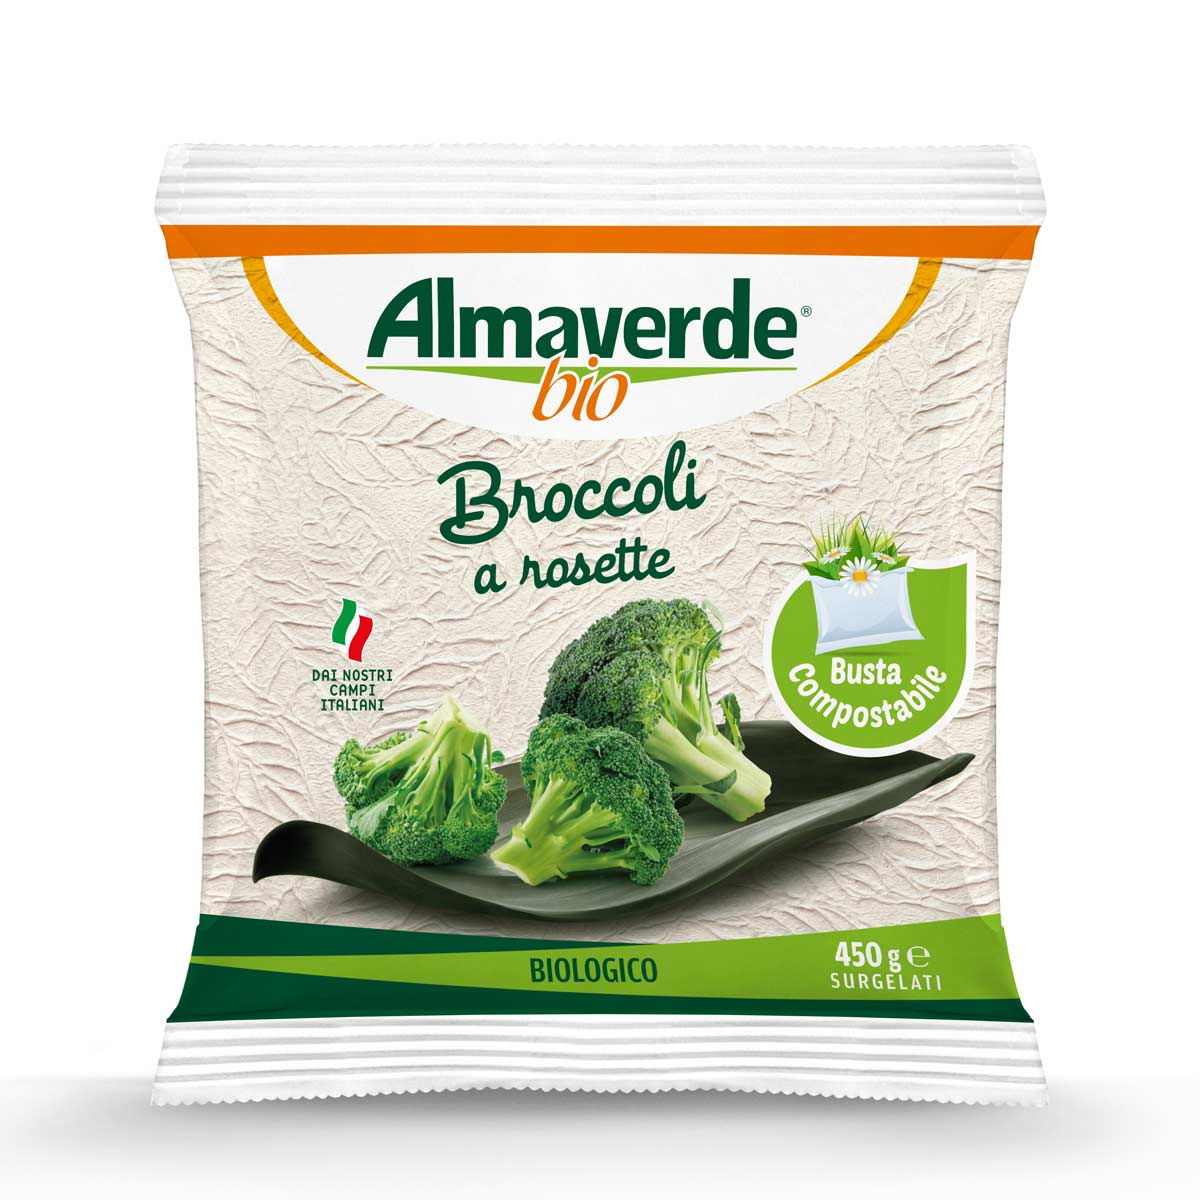 pack biodegradabili Almaverde Bio